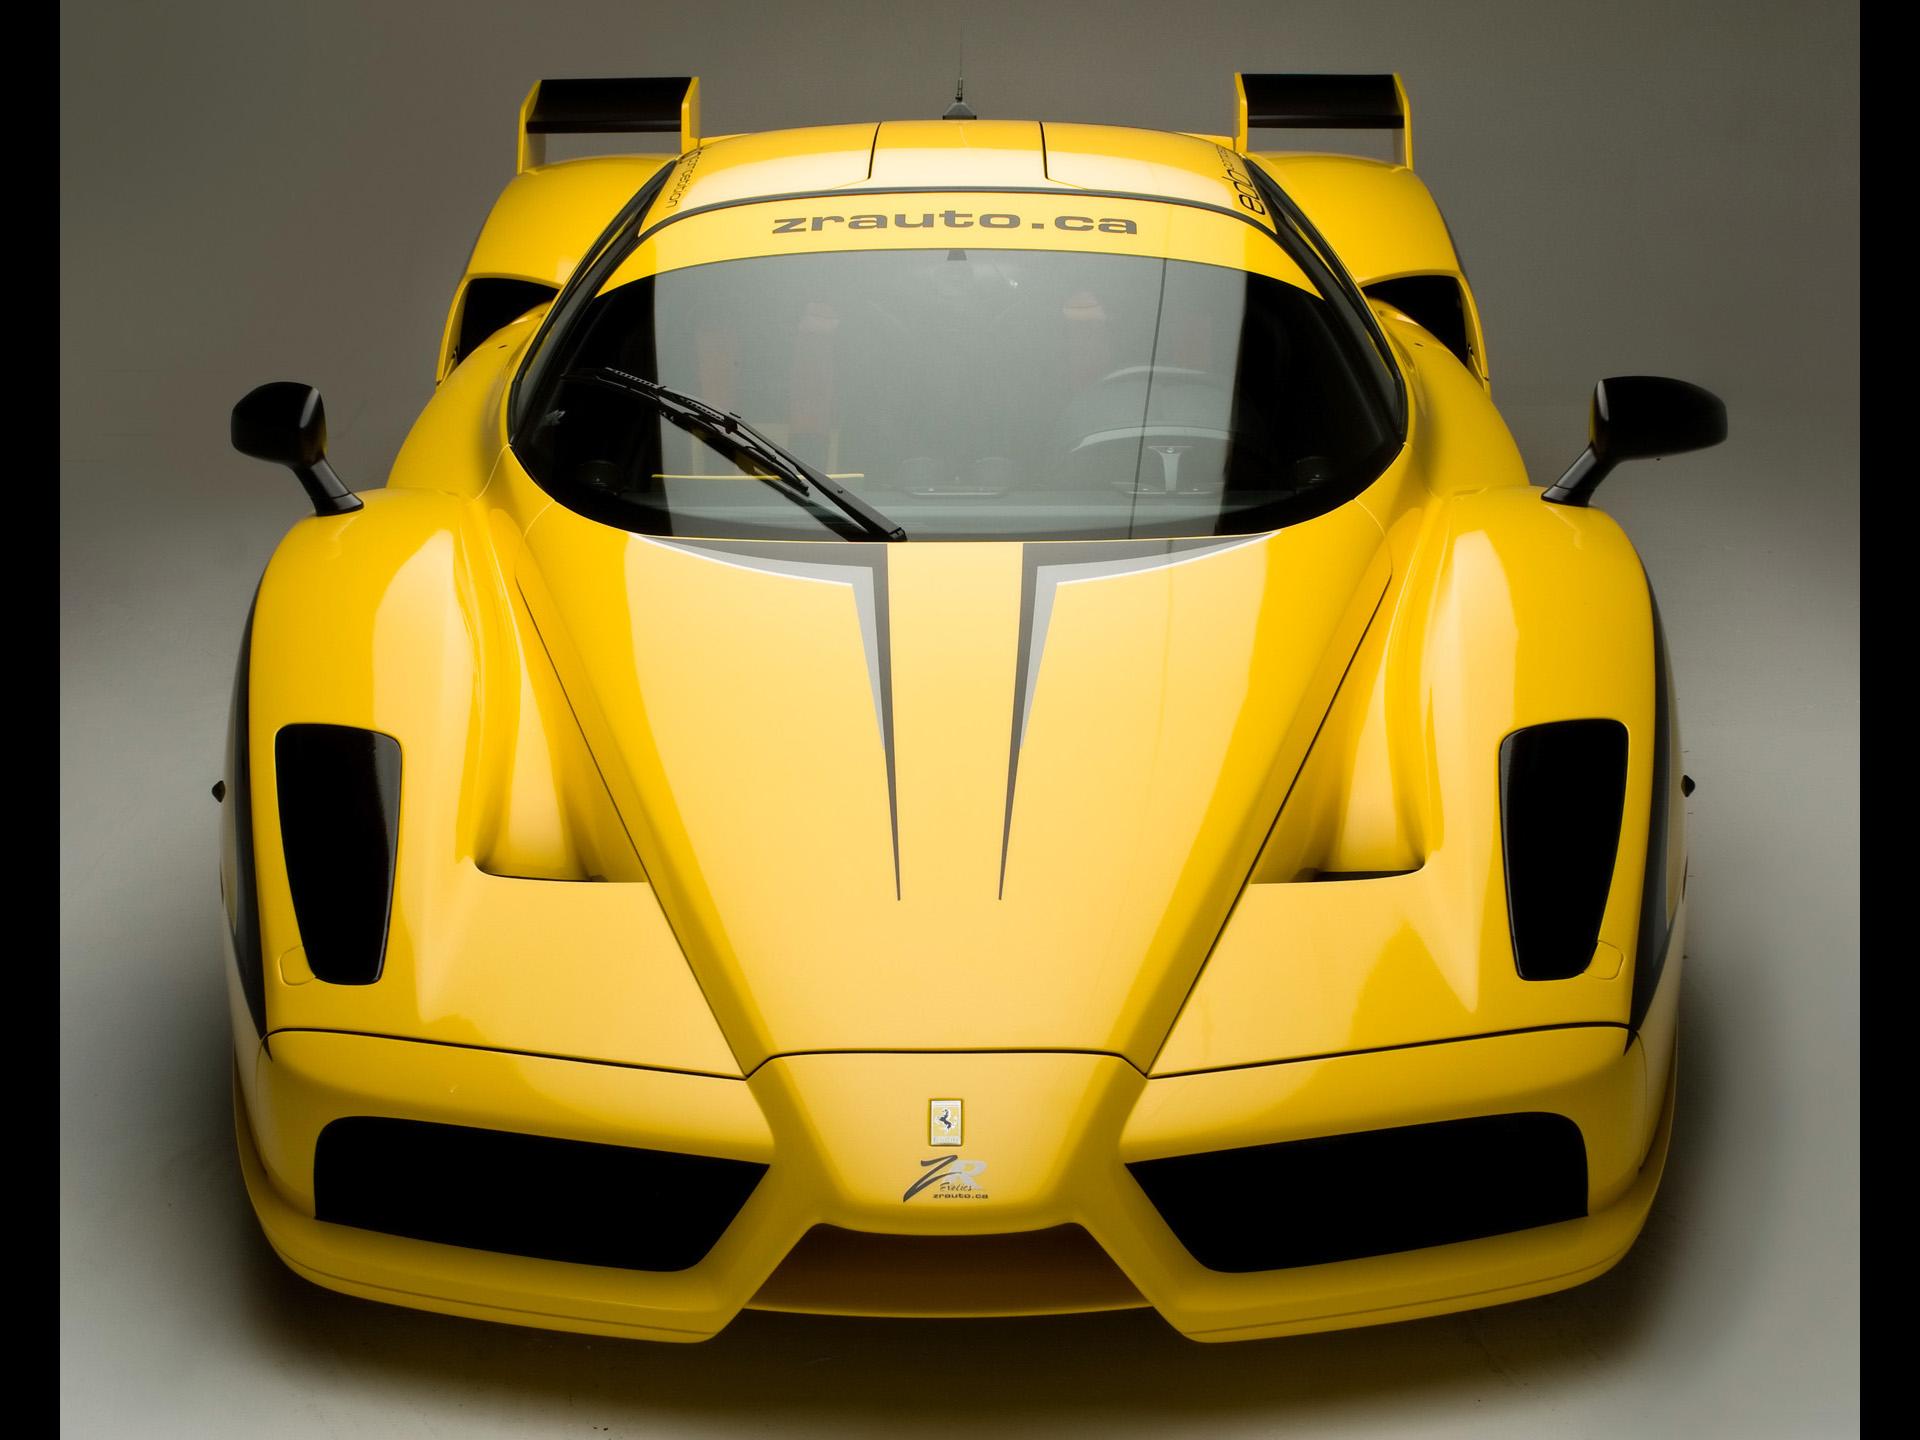 2010 edo competition ferrari enzo xx evolution supercar x x wallpaper - Ferrari Enzo 2010